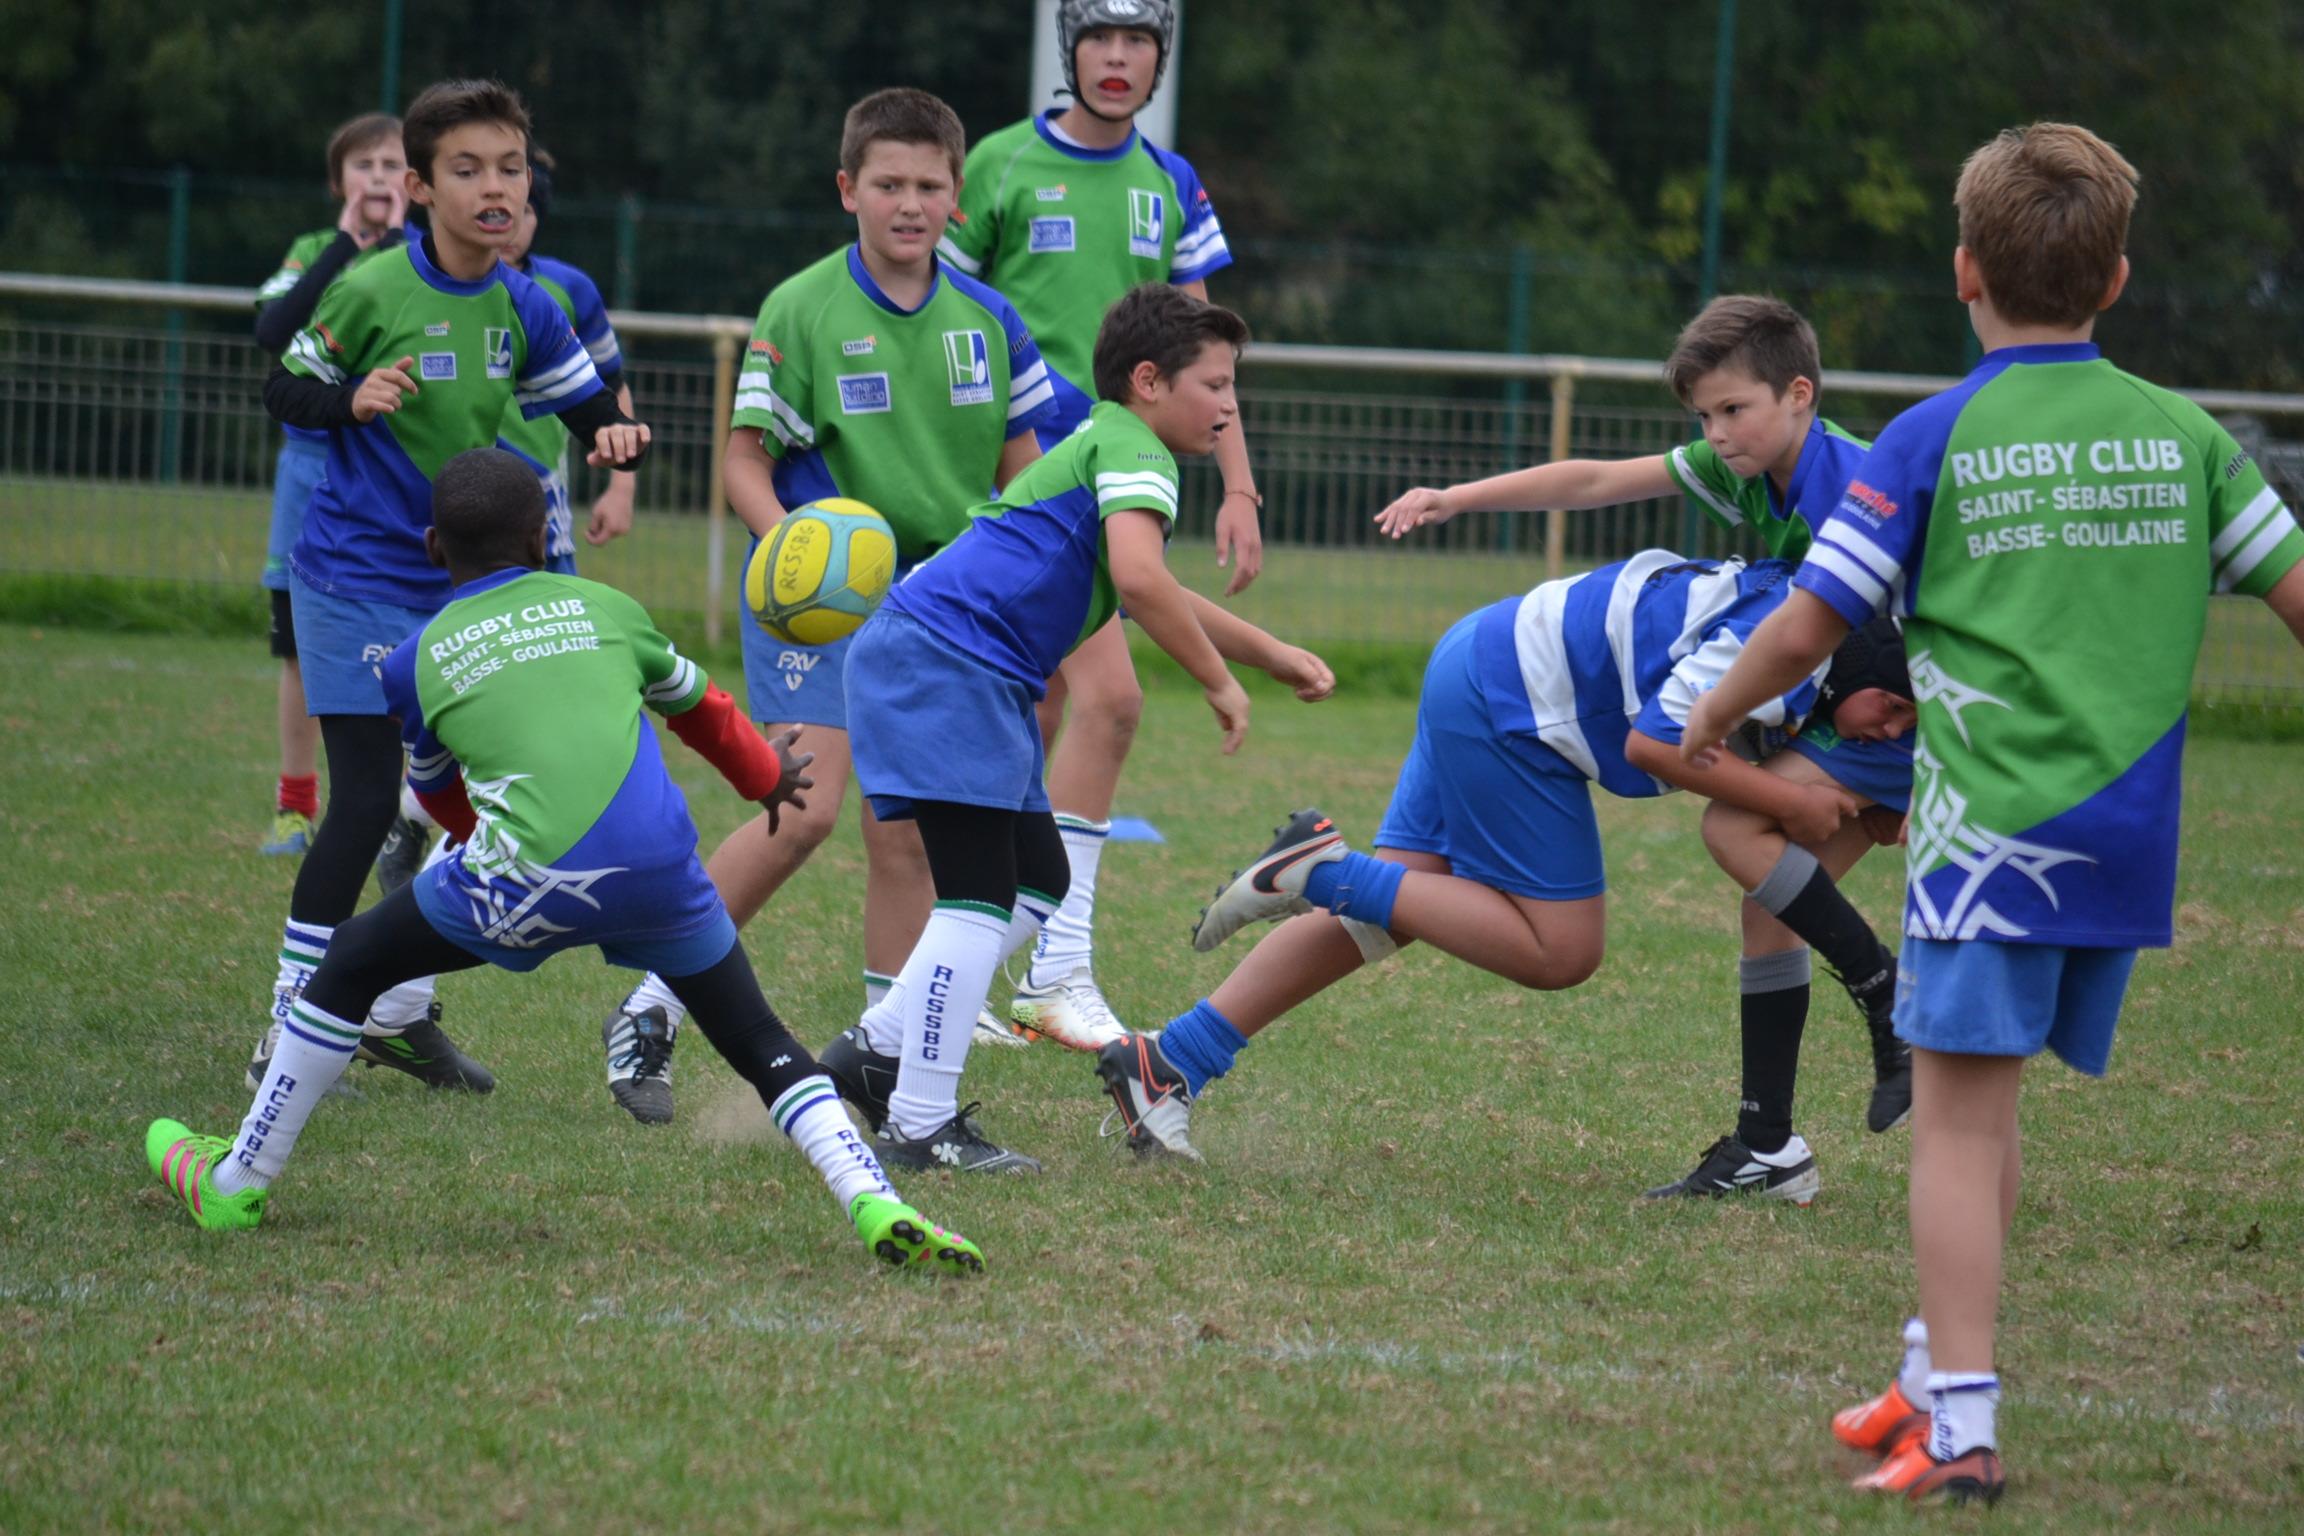 RCSSBG – Rugby Club Saint Sébastien – Basse Goulaine